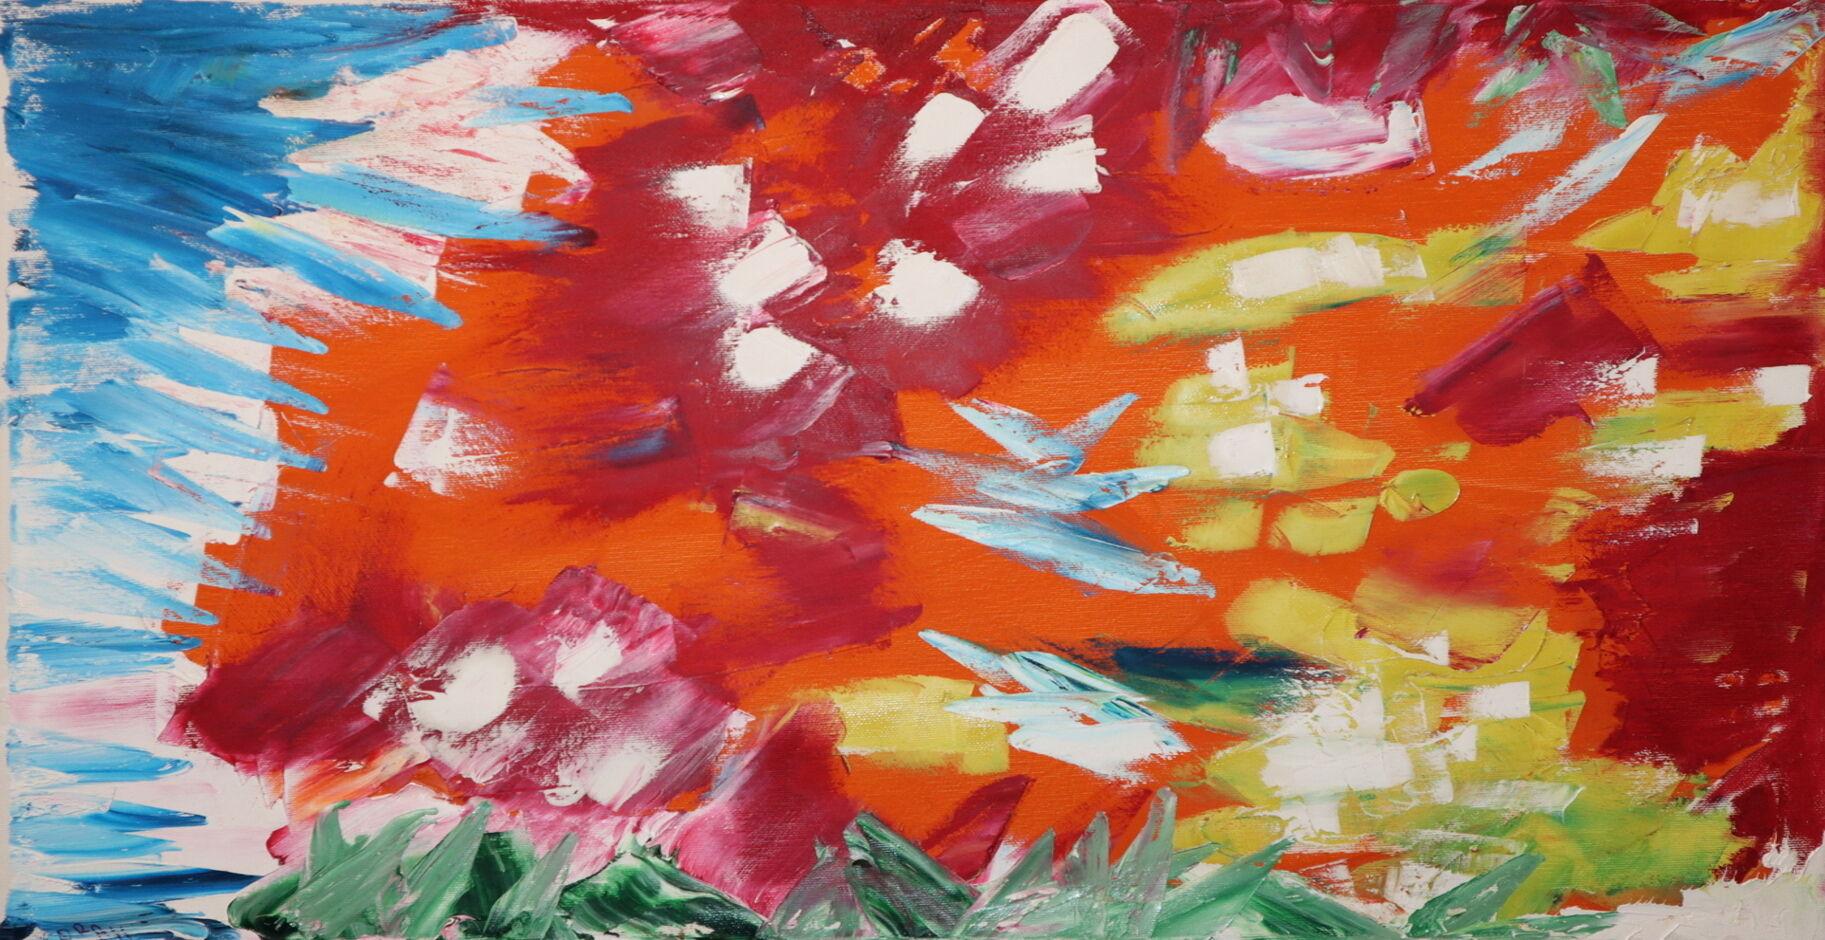 Abstract oil paint ORAHART Israeli painter – Swetlana Zakharyan